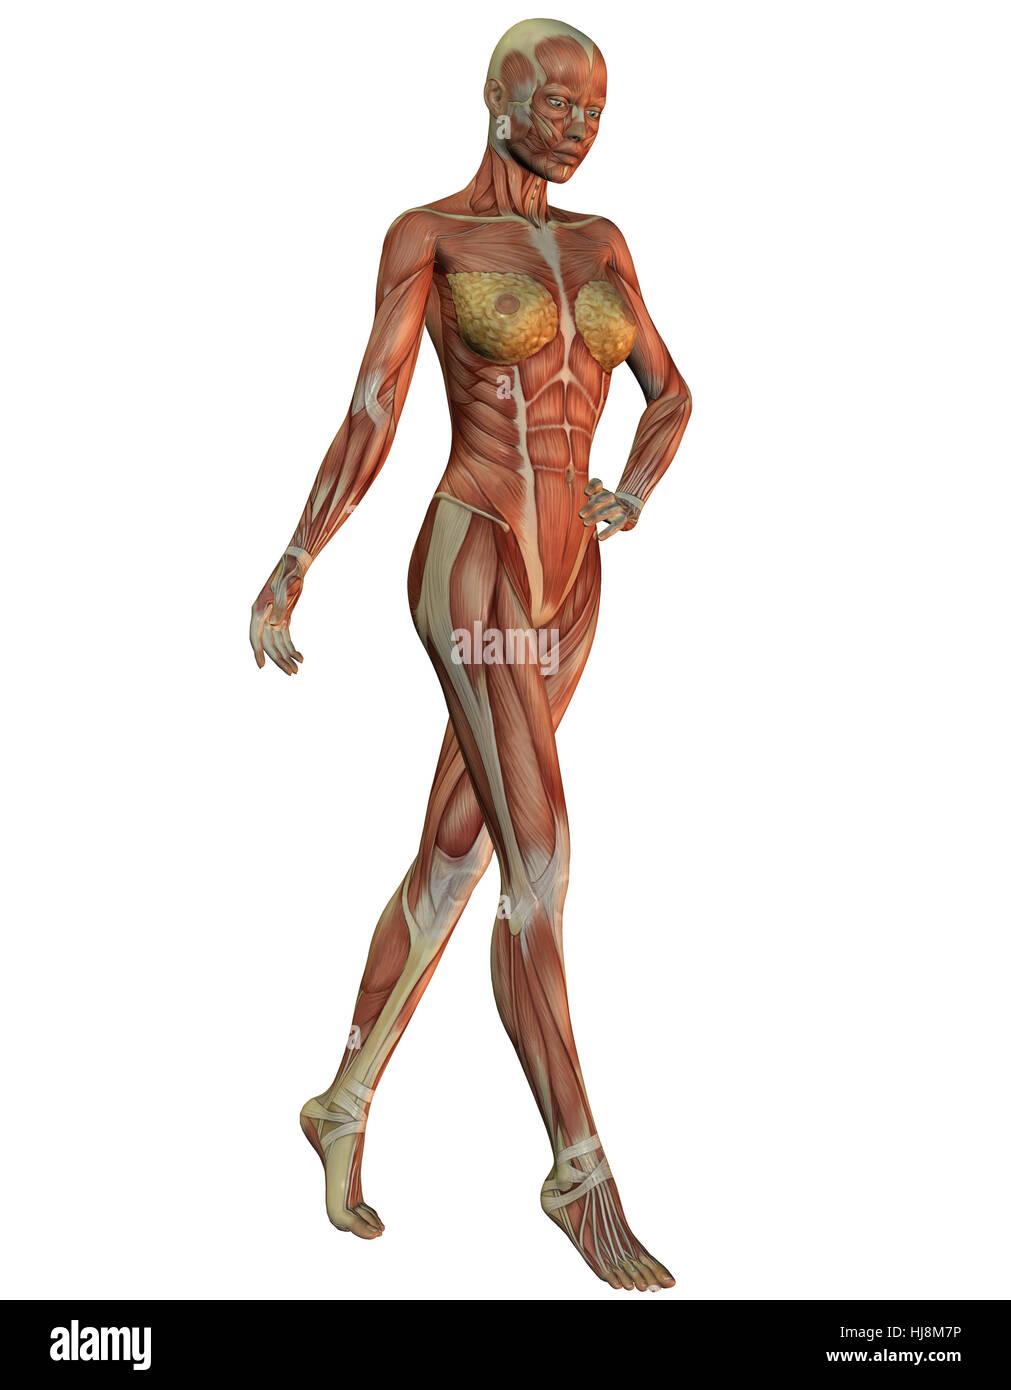 dentrodabiblia: anatomie